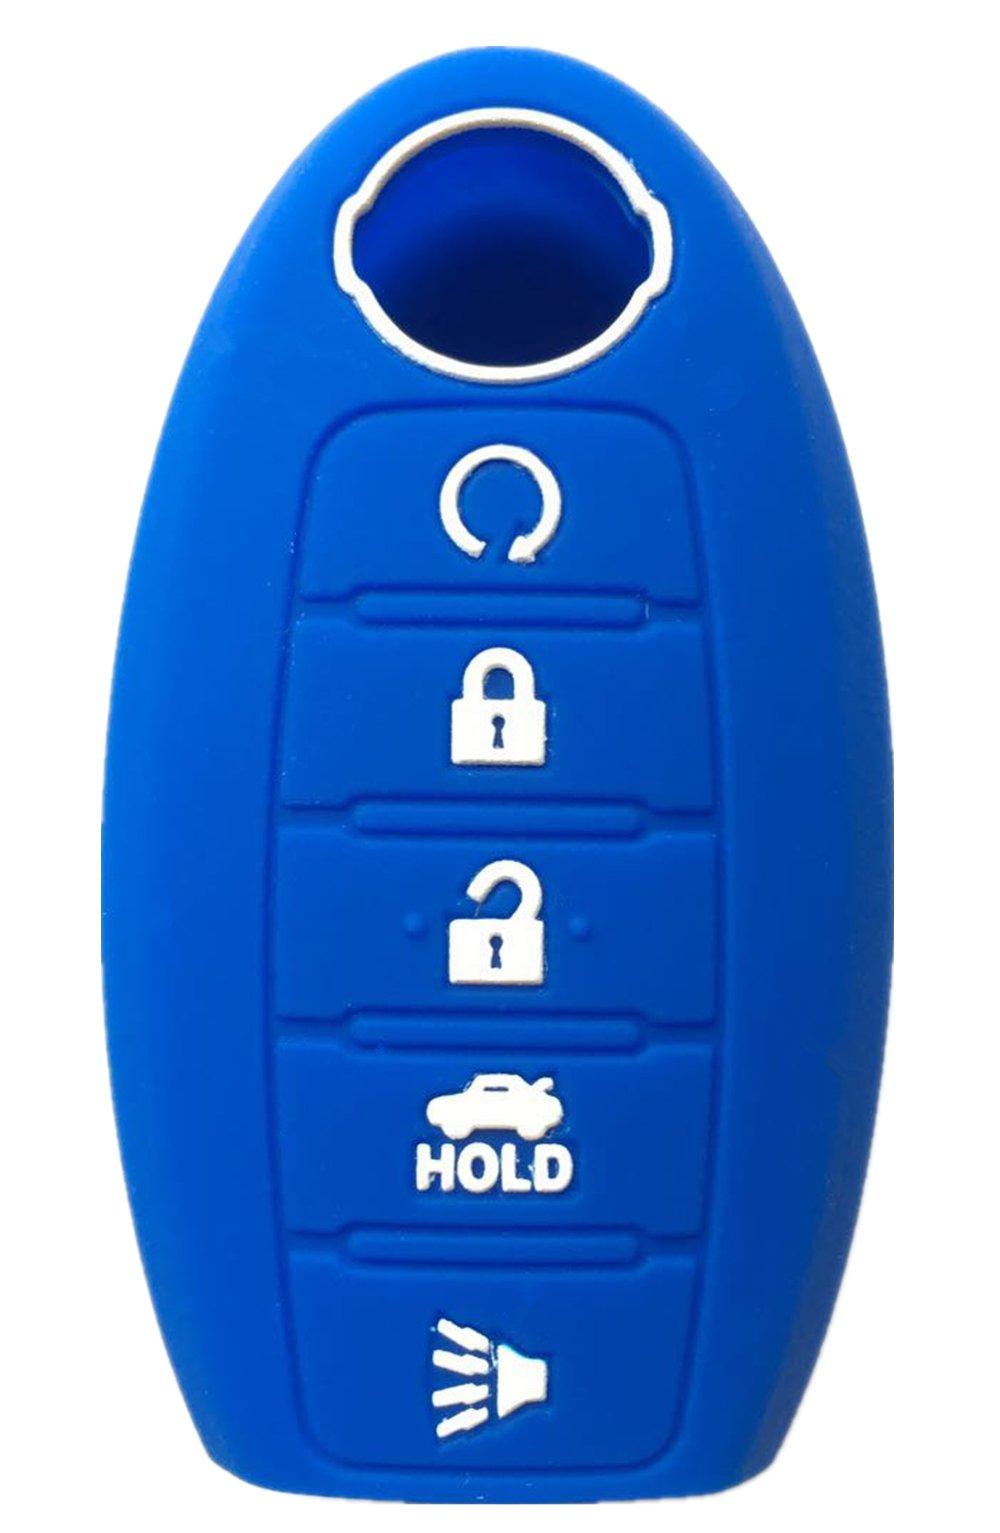 2Pcs WERFDSR Sillicone key fob Skin key Cover Keyless Entry Remote Case Protector Shell for 2013-2015 Nissan Altima Sedan Nissan Pathfinder light blue